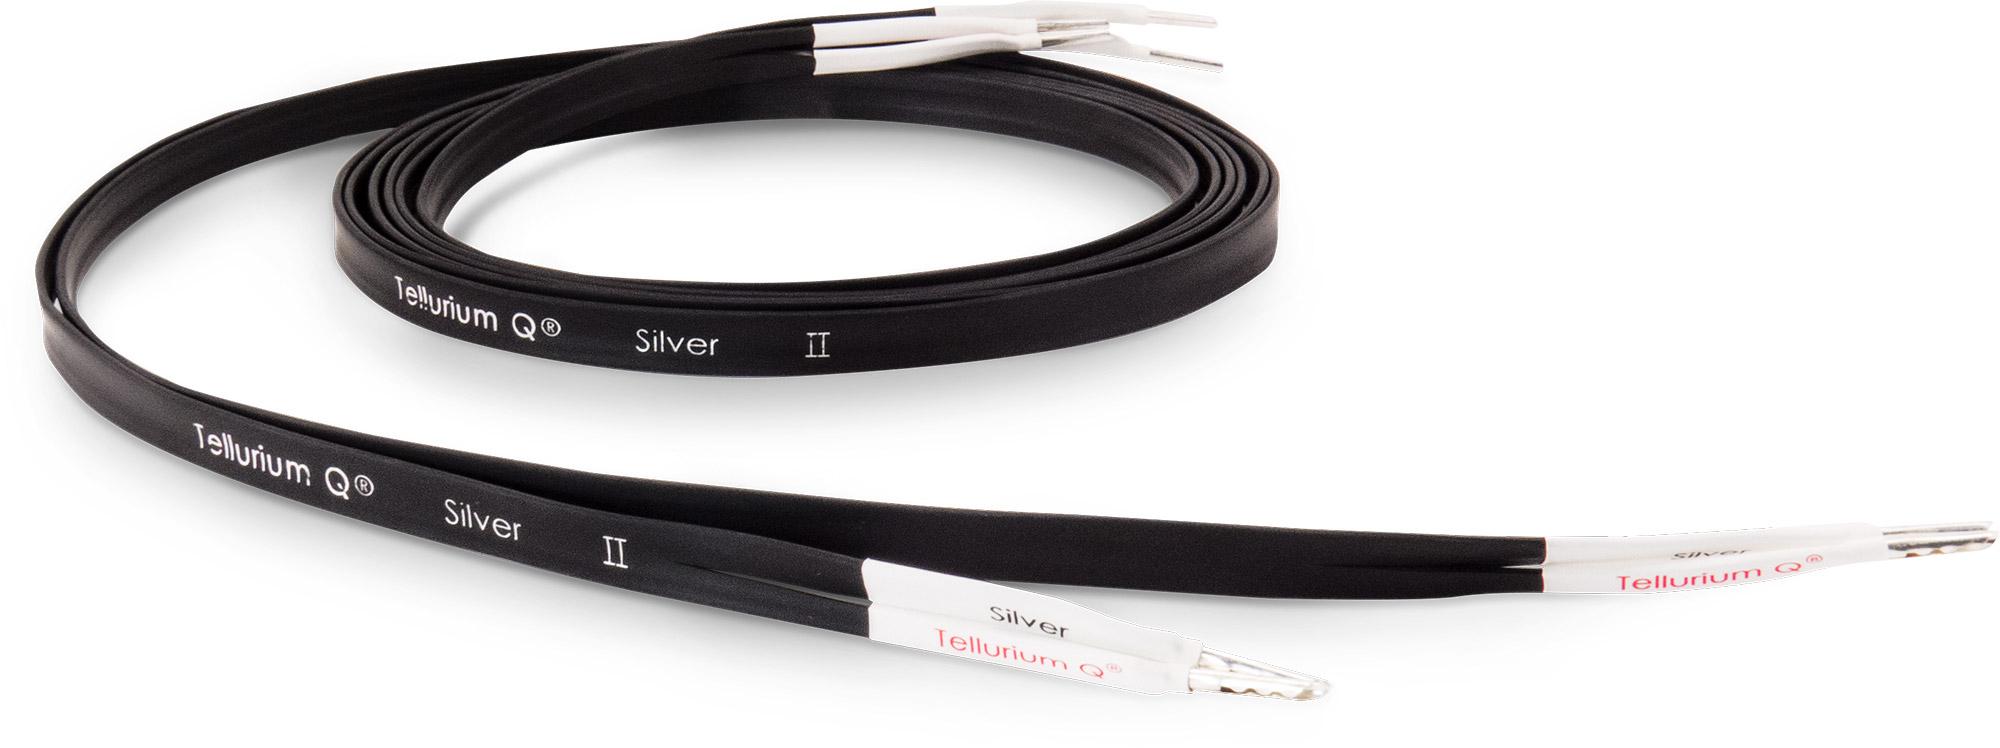 Silver II Lautsprecherkabel